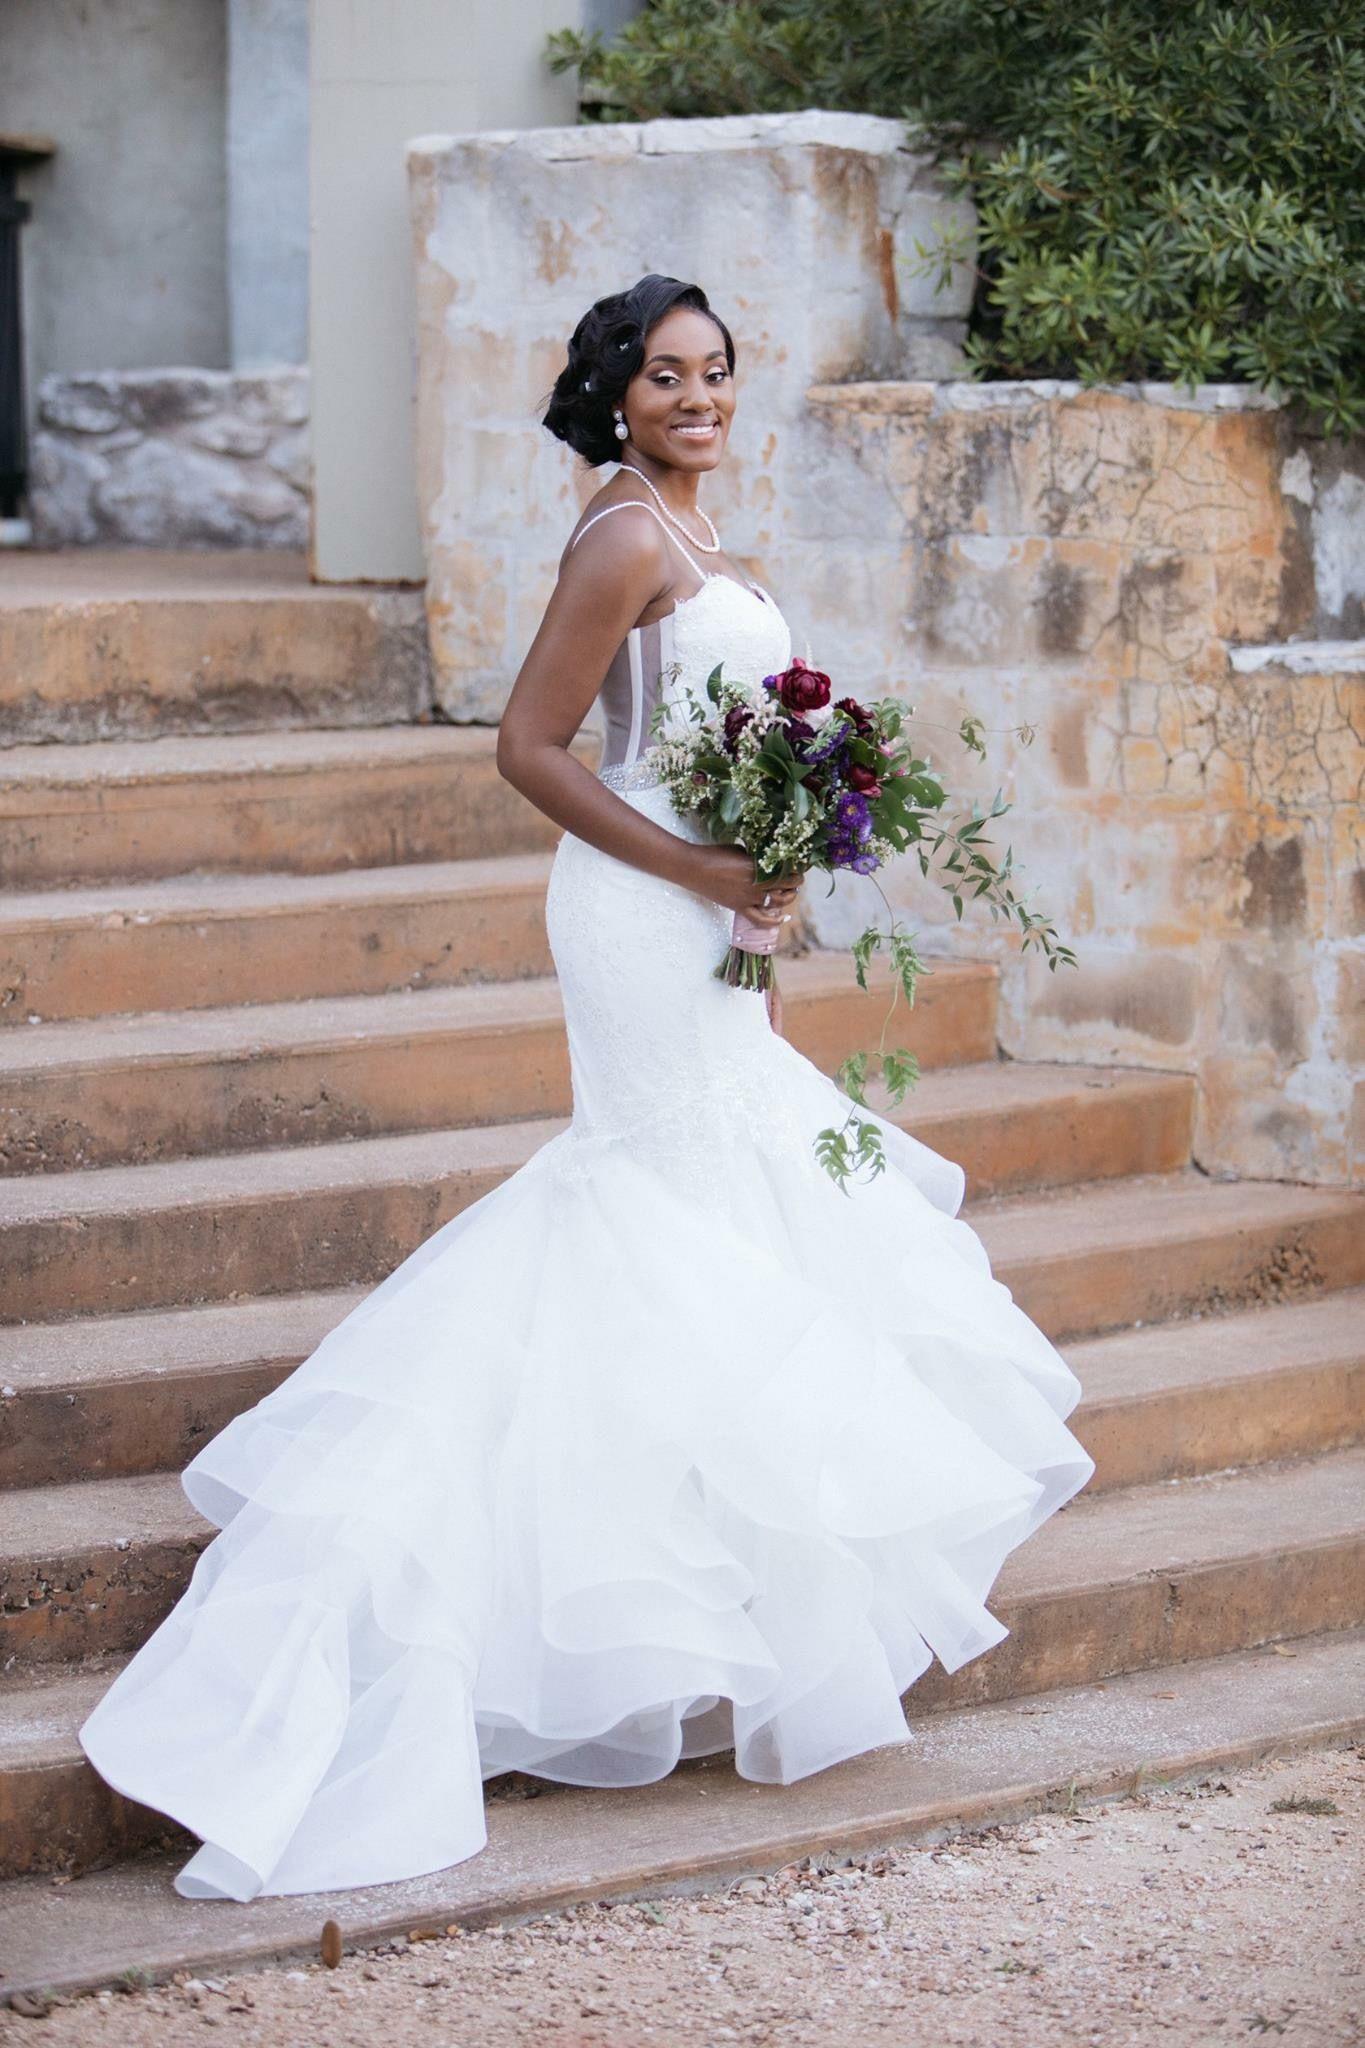 Pnina wedding dress  Pnina Tornai dress Blush and plum vintage wedding  Happily Ever